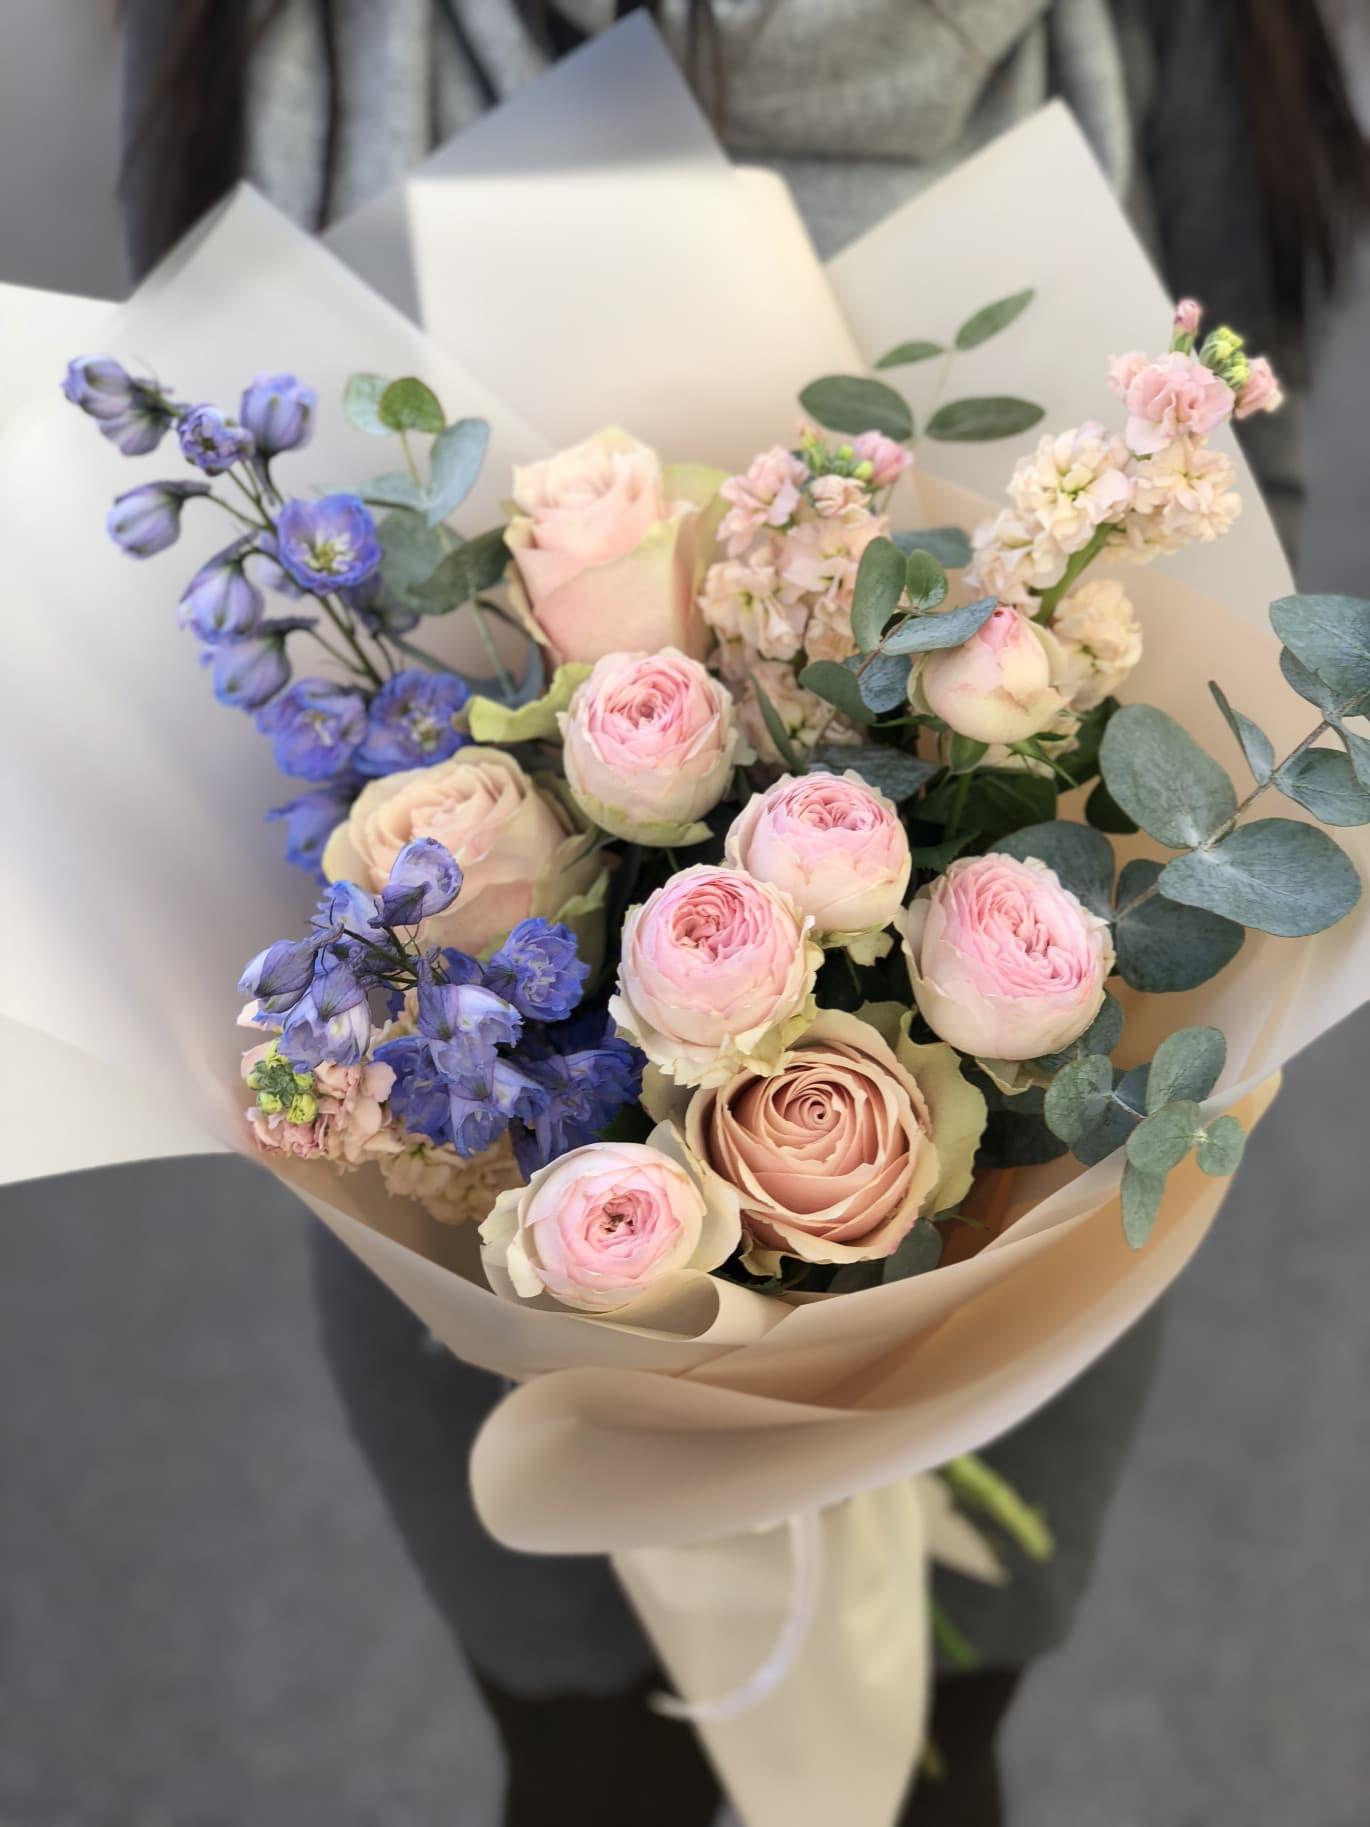 Букет Нежные чувства – Інтернет-магазин квітів STUDIO Flores